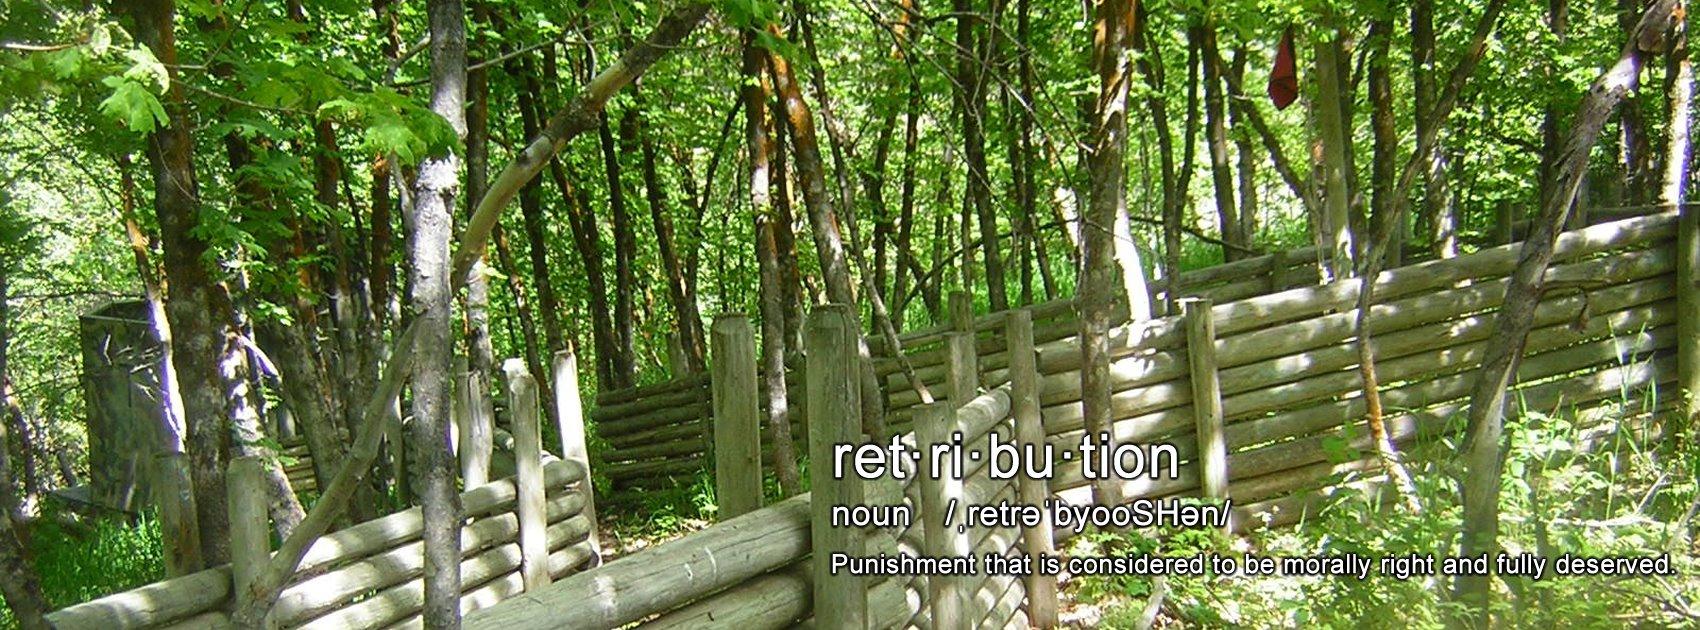 retribution paintball field photo